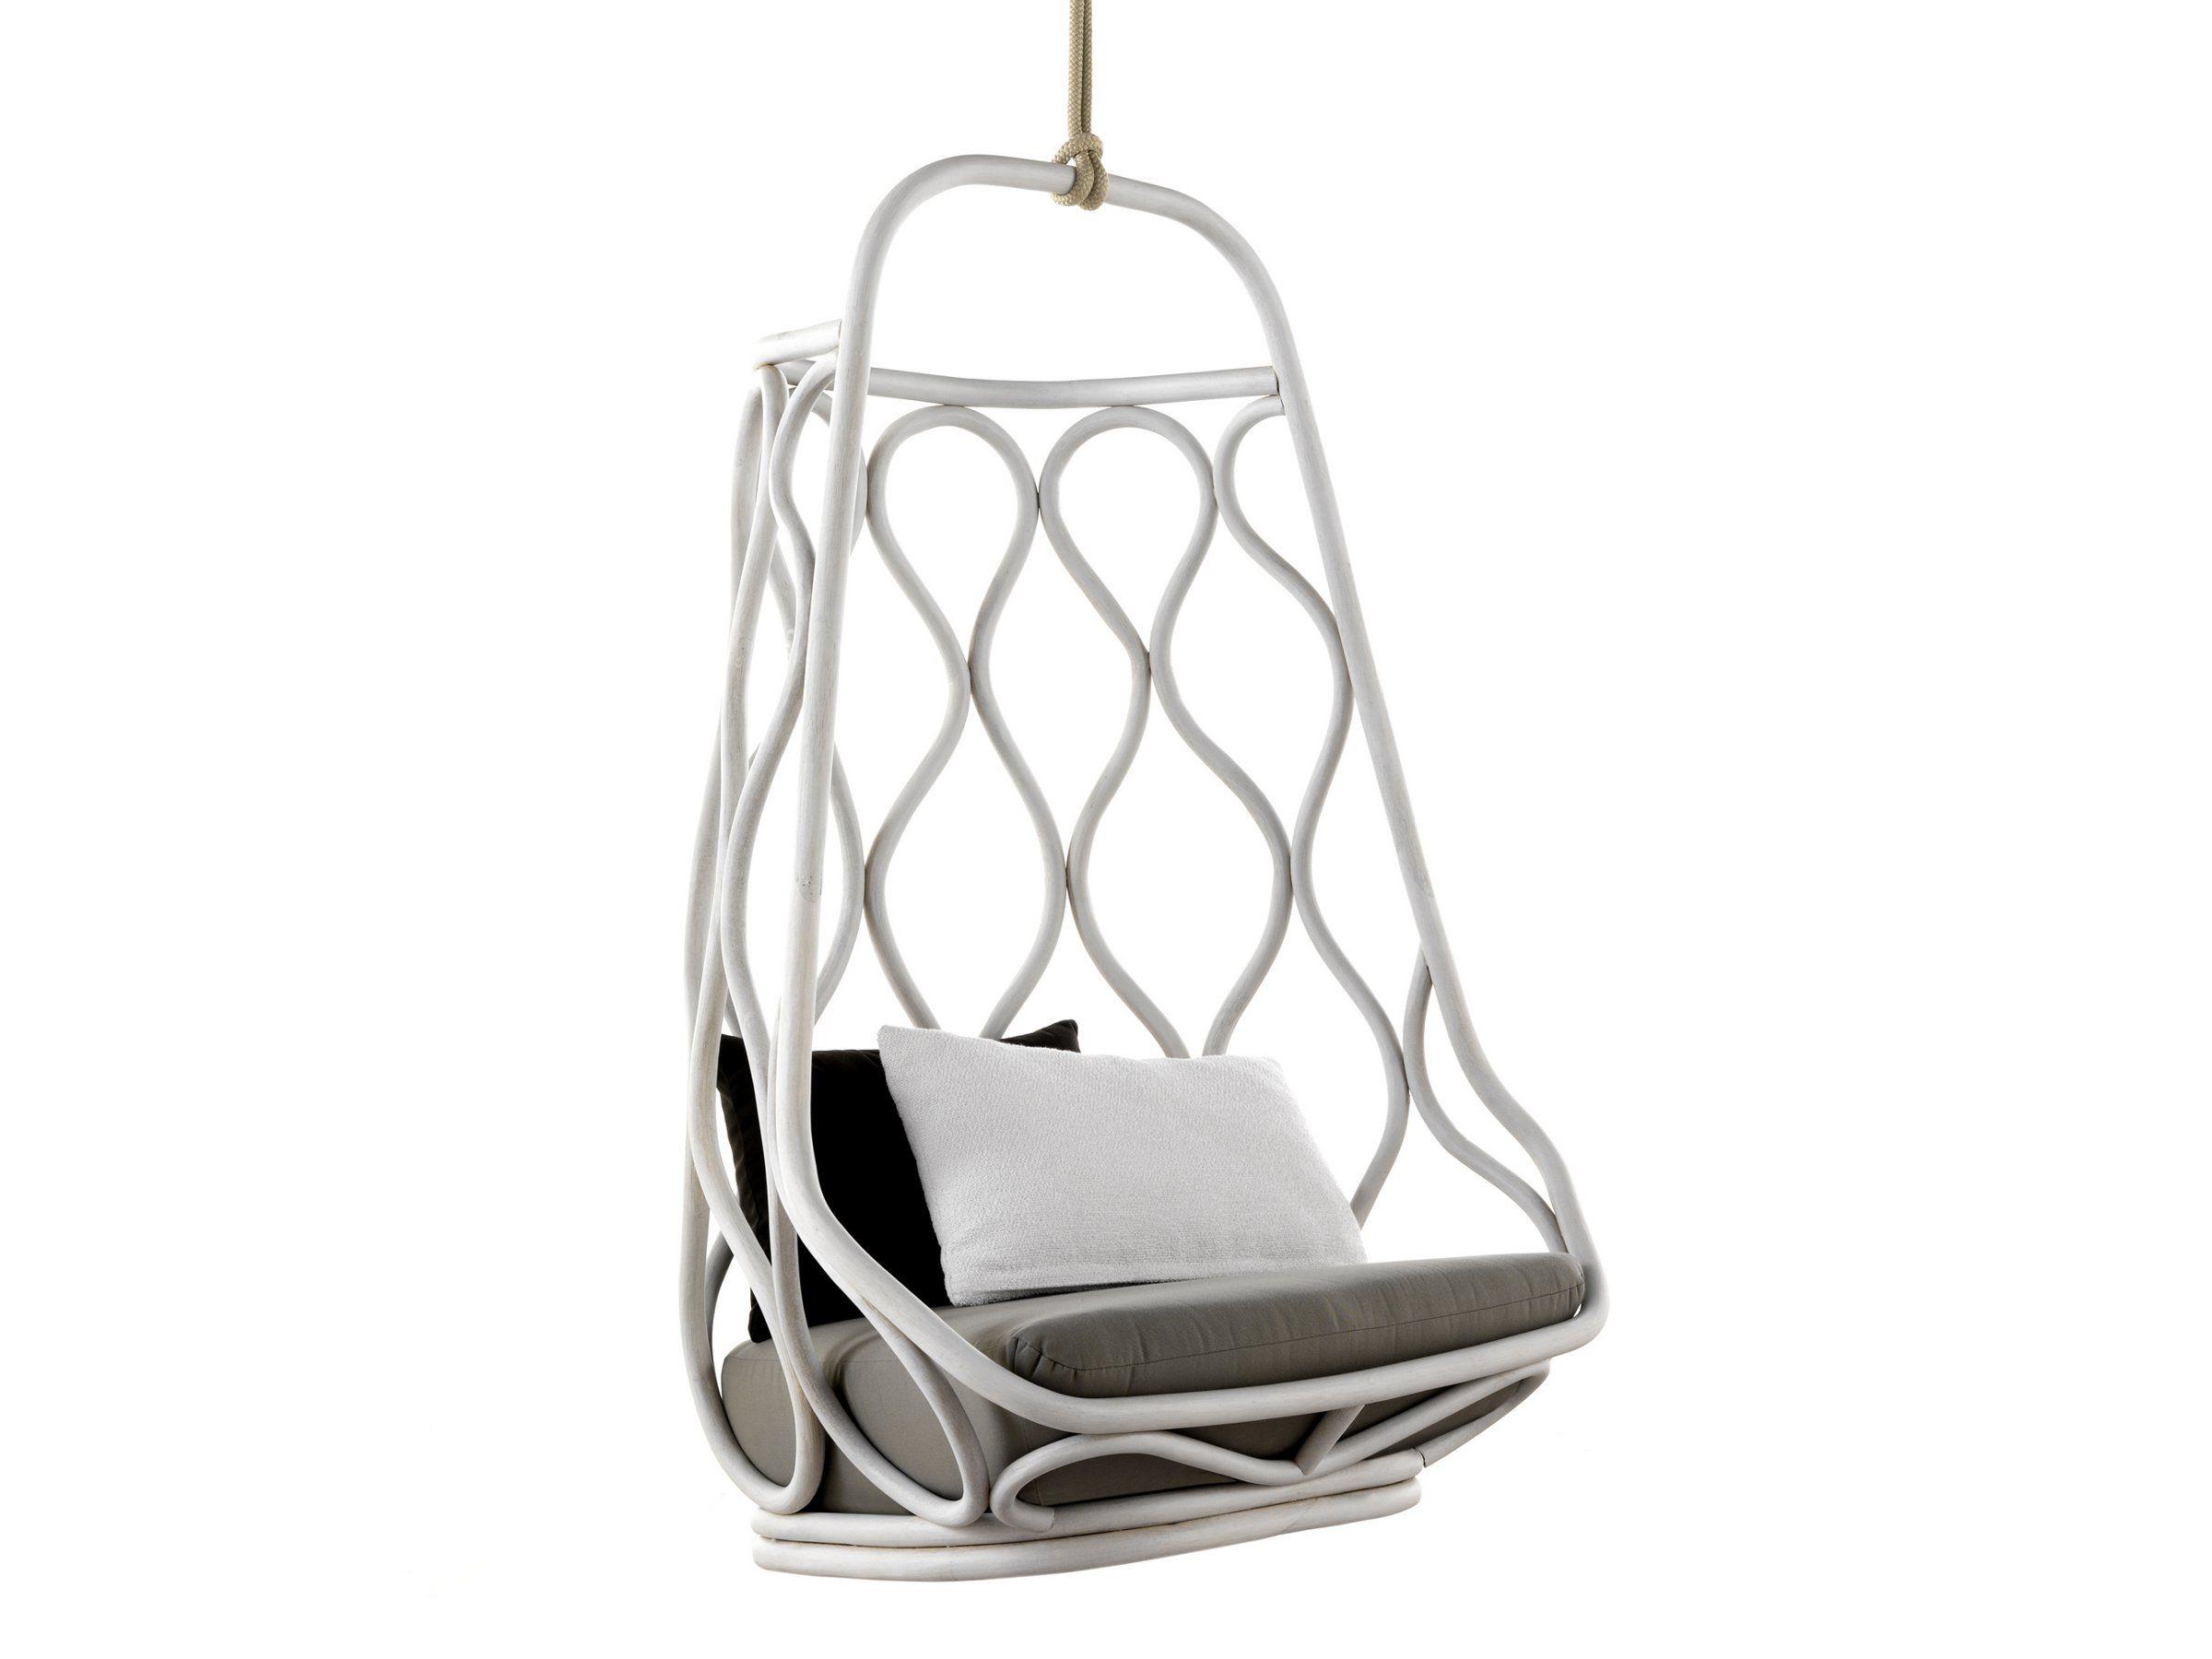 Hanging Rattan Chair White -